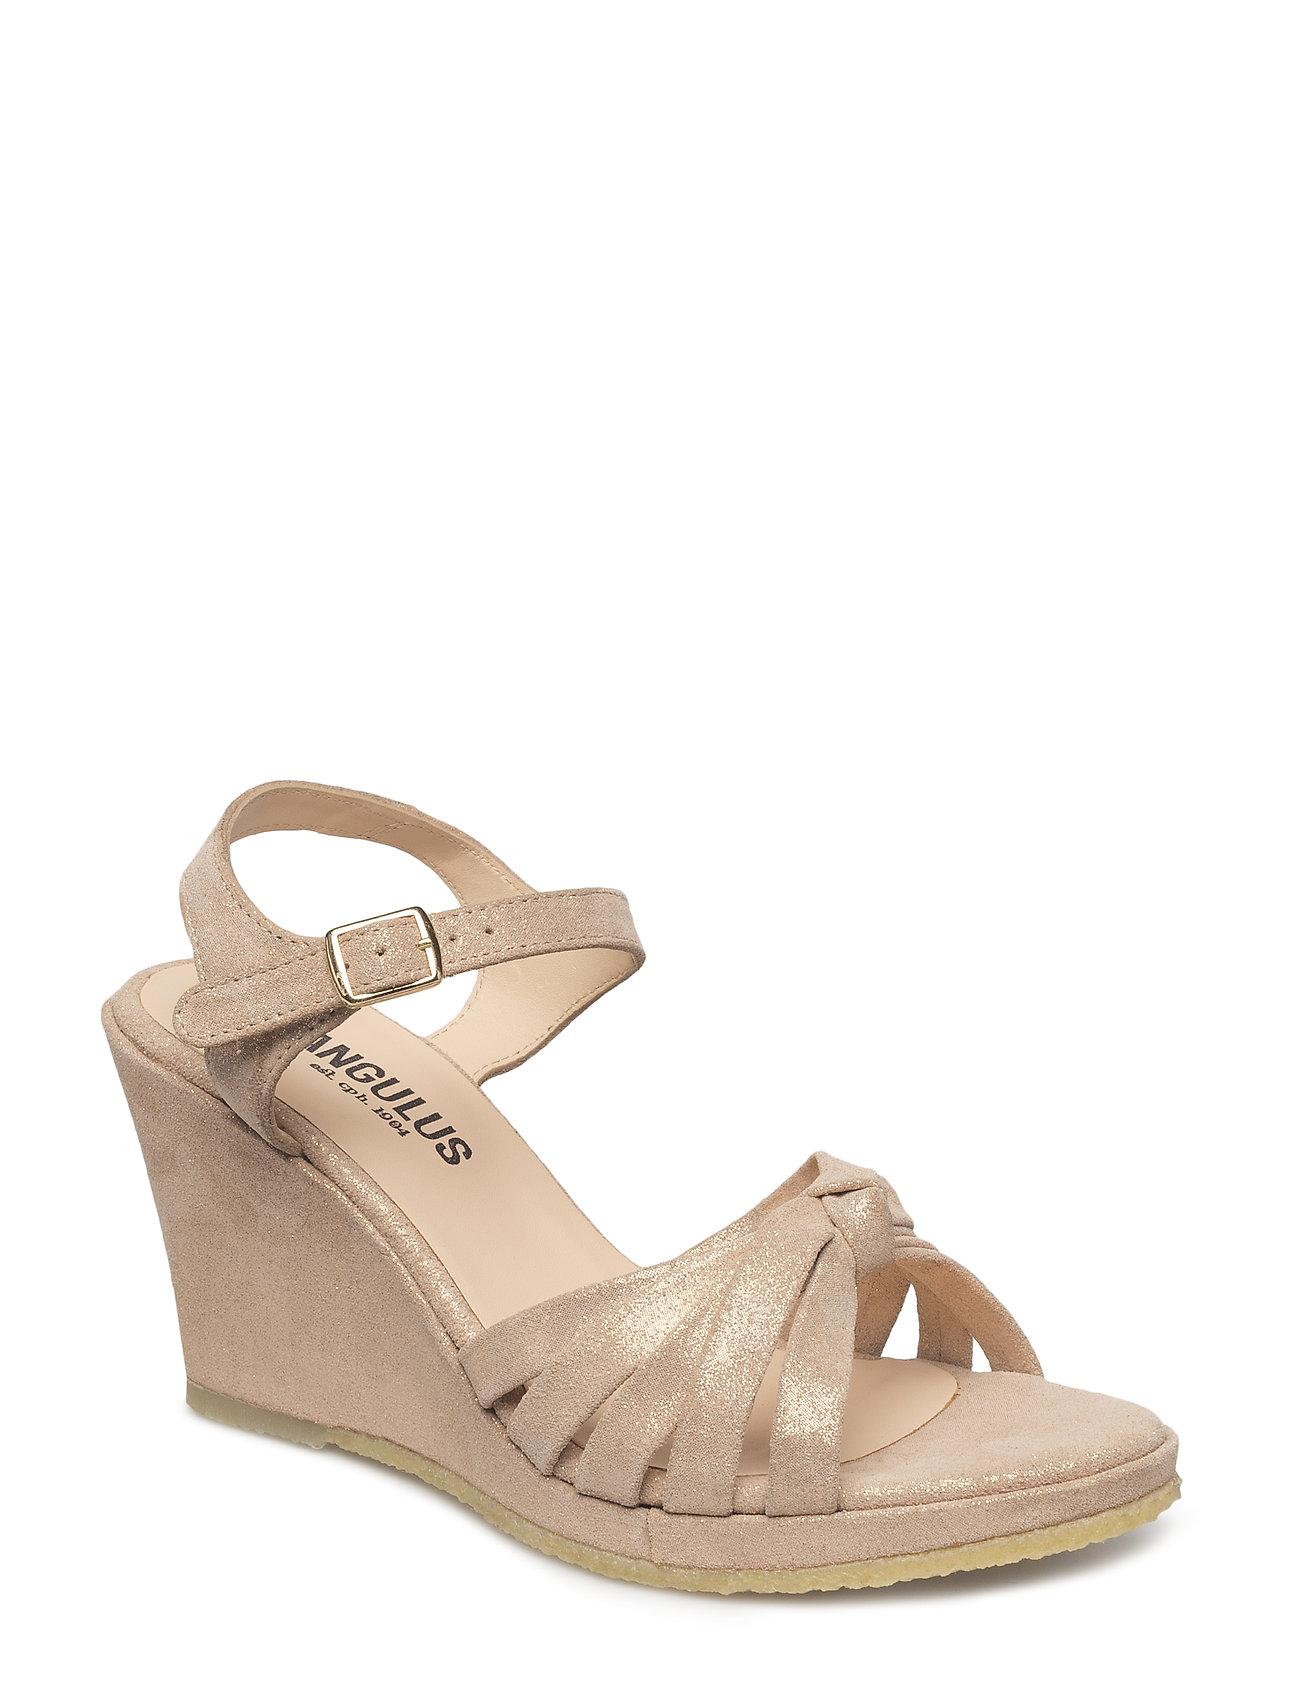 2b55963b8c6d Sandals - Wedge - Open Toe - (2181 Copper Glitter) (899.50 kr ...